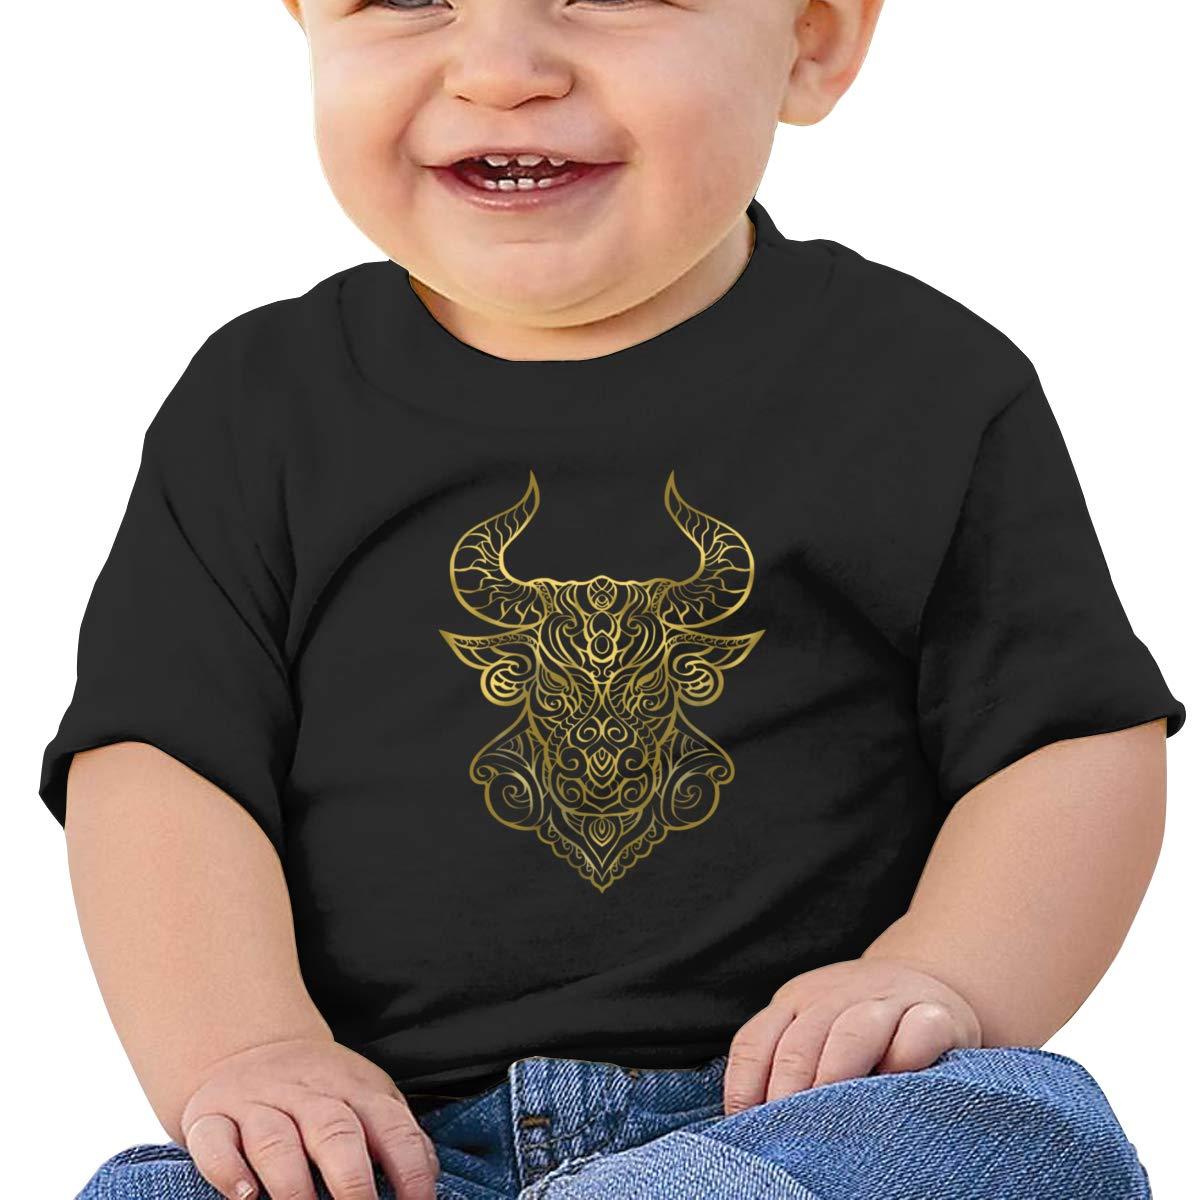 Qiop Nee Taurus Gold Short Sleeves T-Shirt Baby Boys